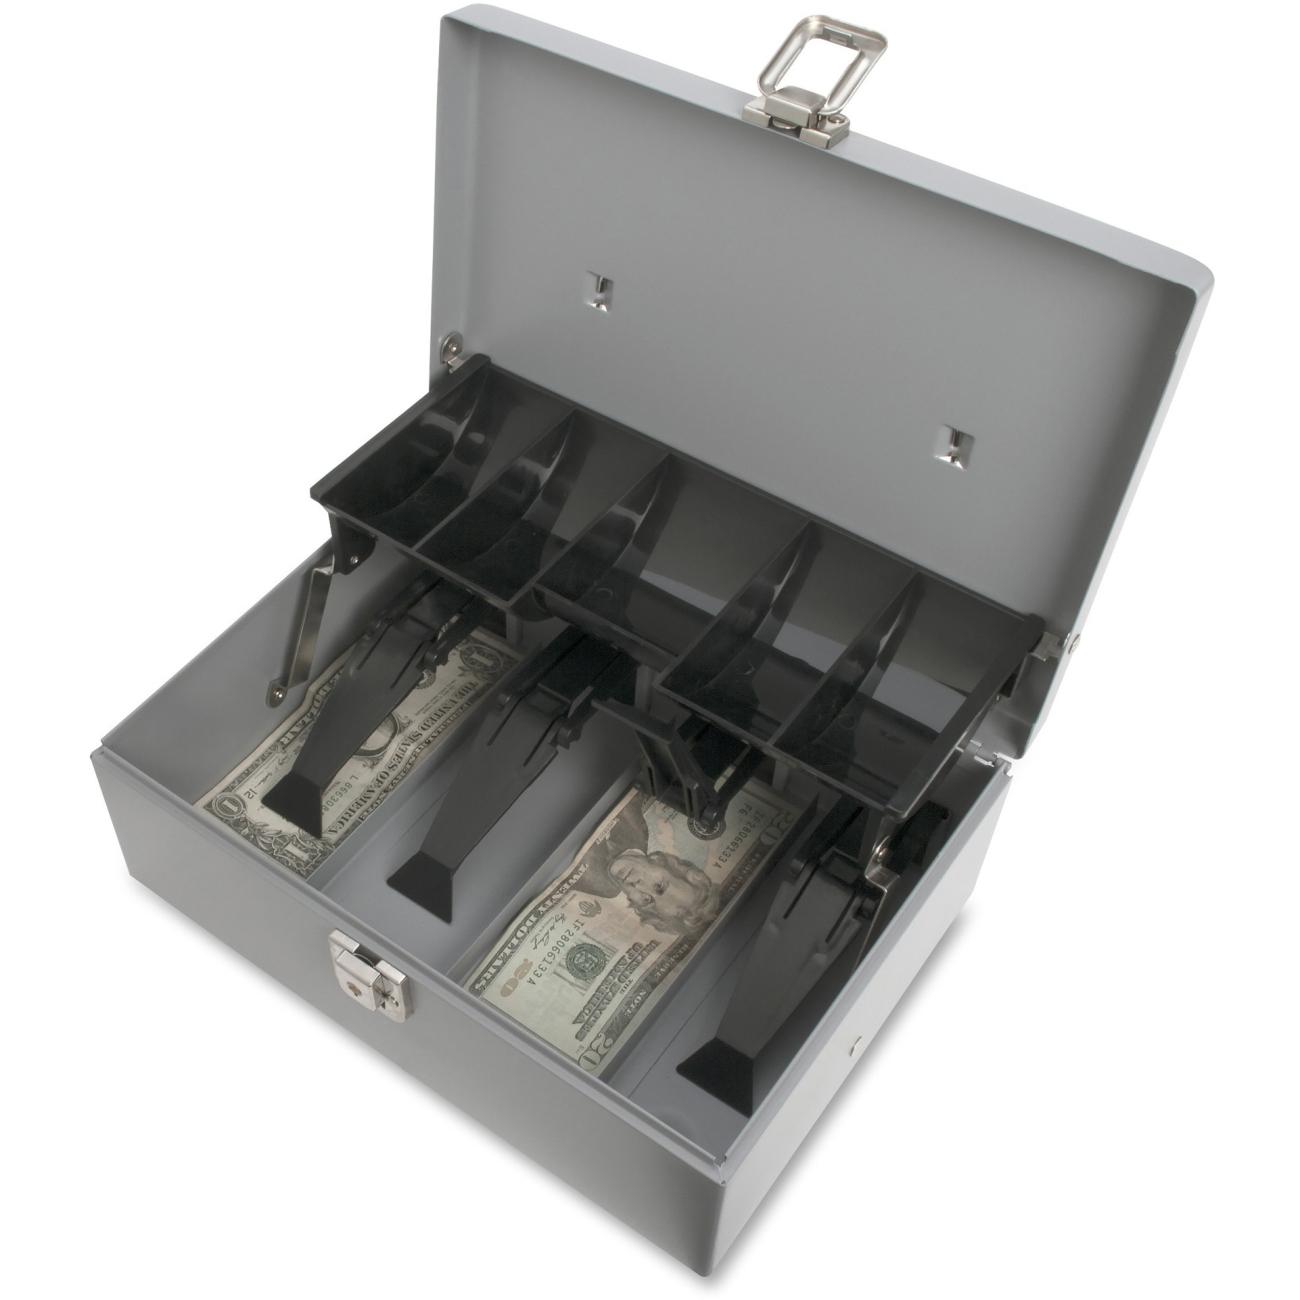 Sparco Cash Handling